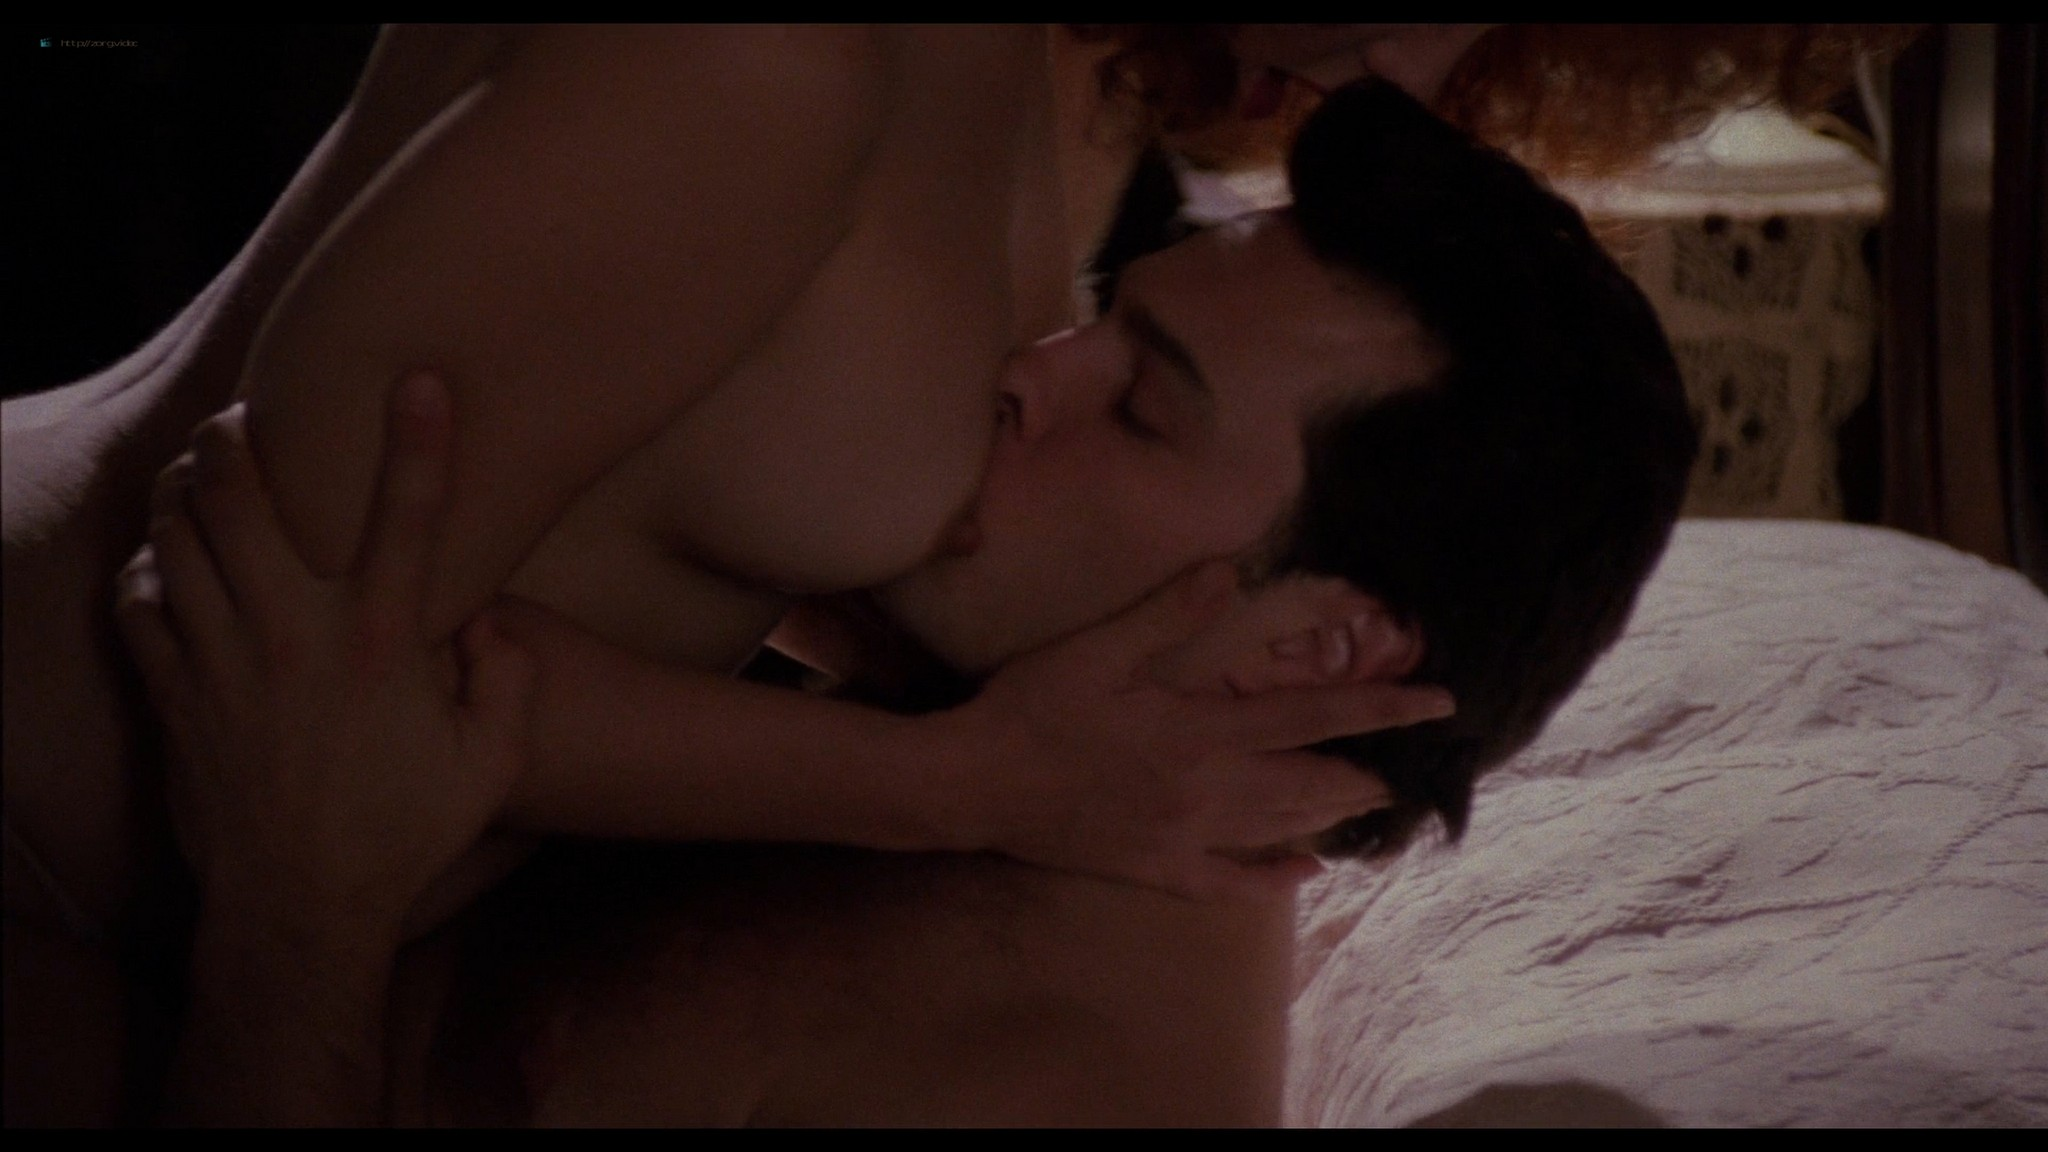 Jennifer Delora nude hot sex - Deadly Manor (1990) HD 1080p BluRay (9)